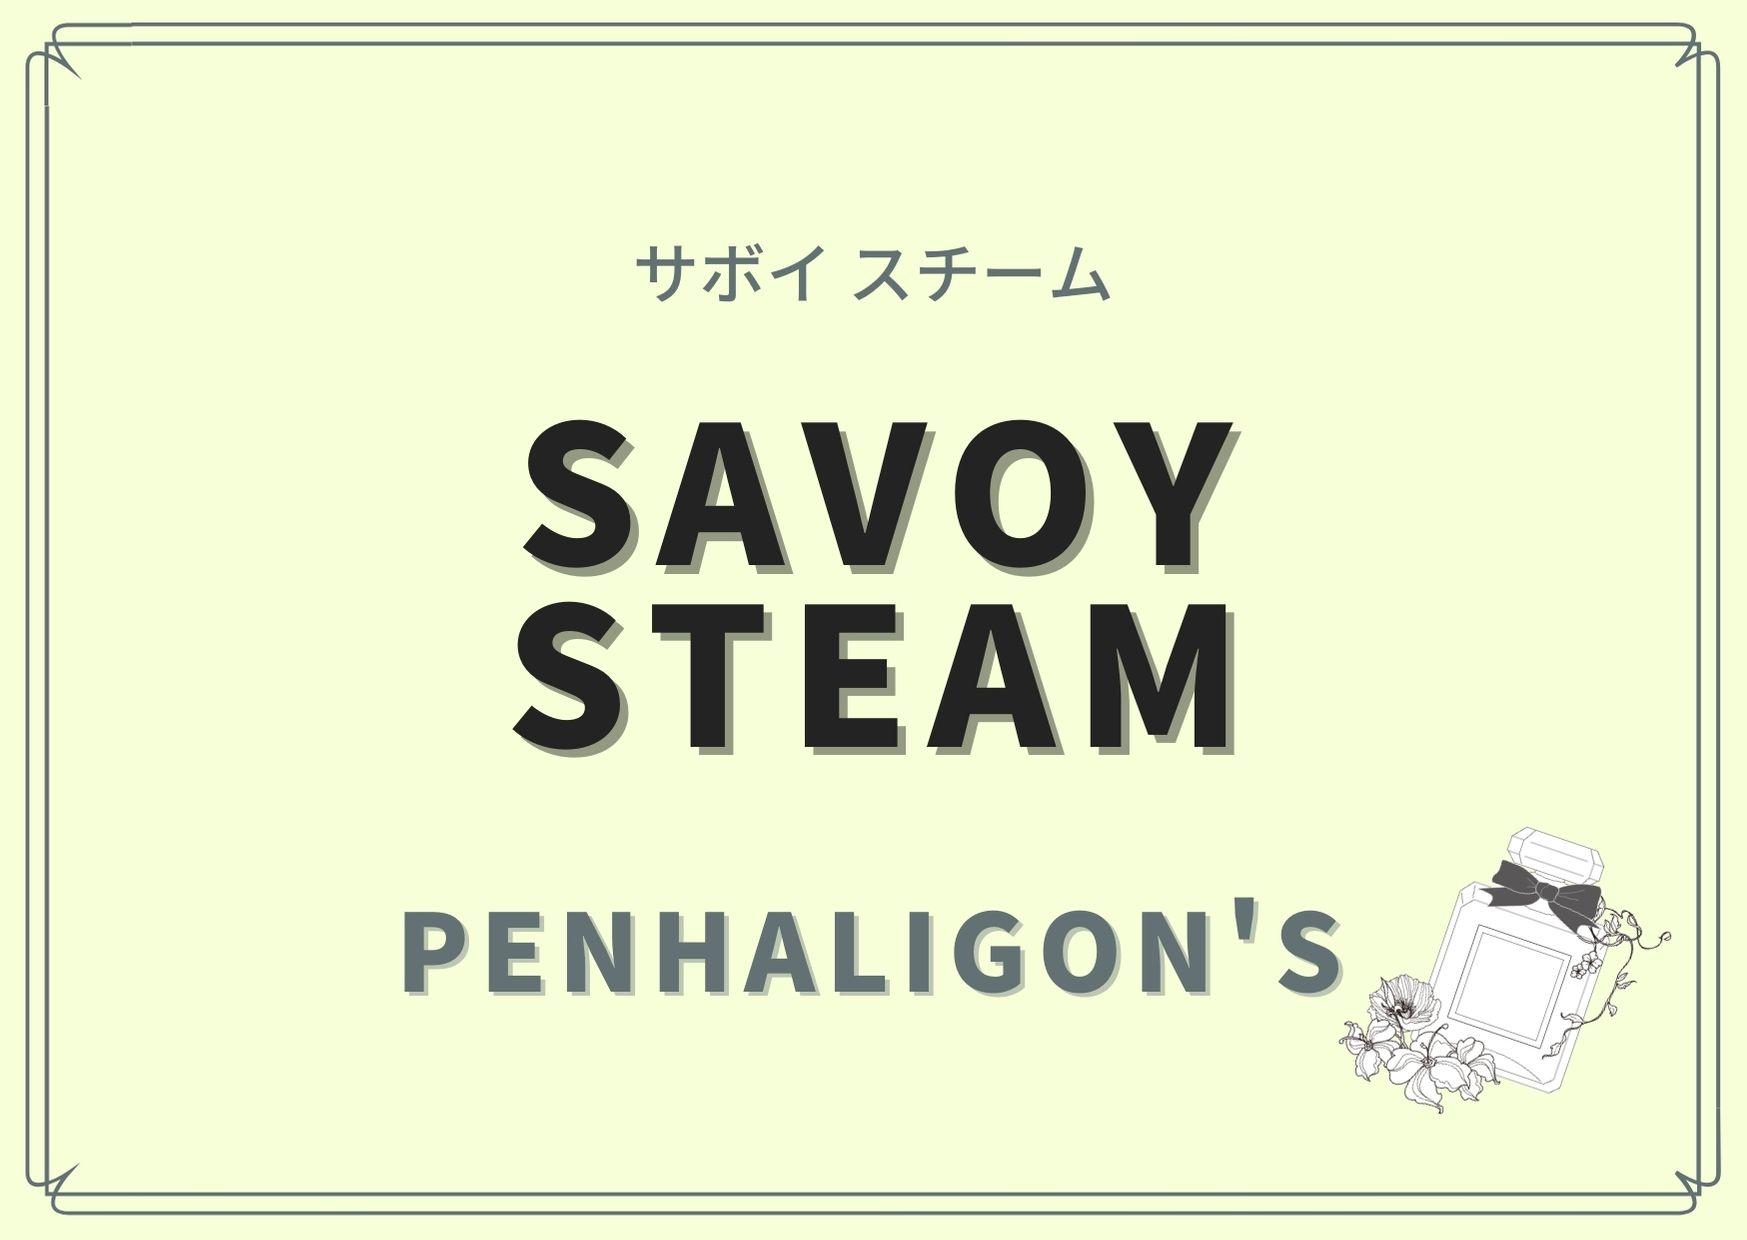 SAVOY STEAM(サボイ スチーム)/PENHALIGON'S(ペンハリガン)